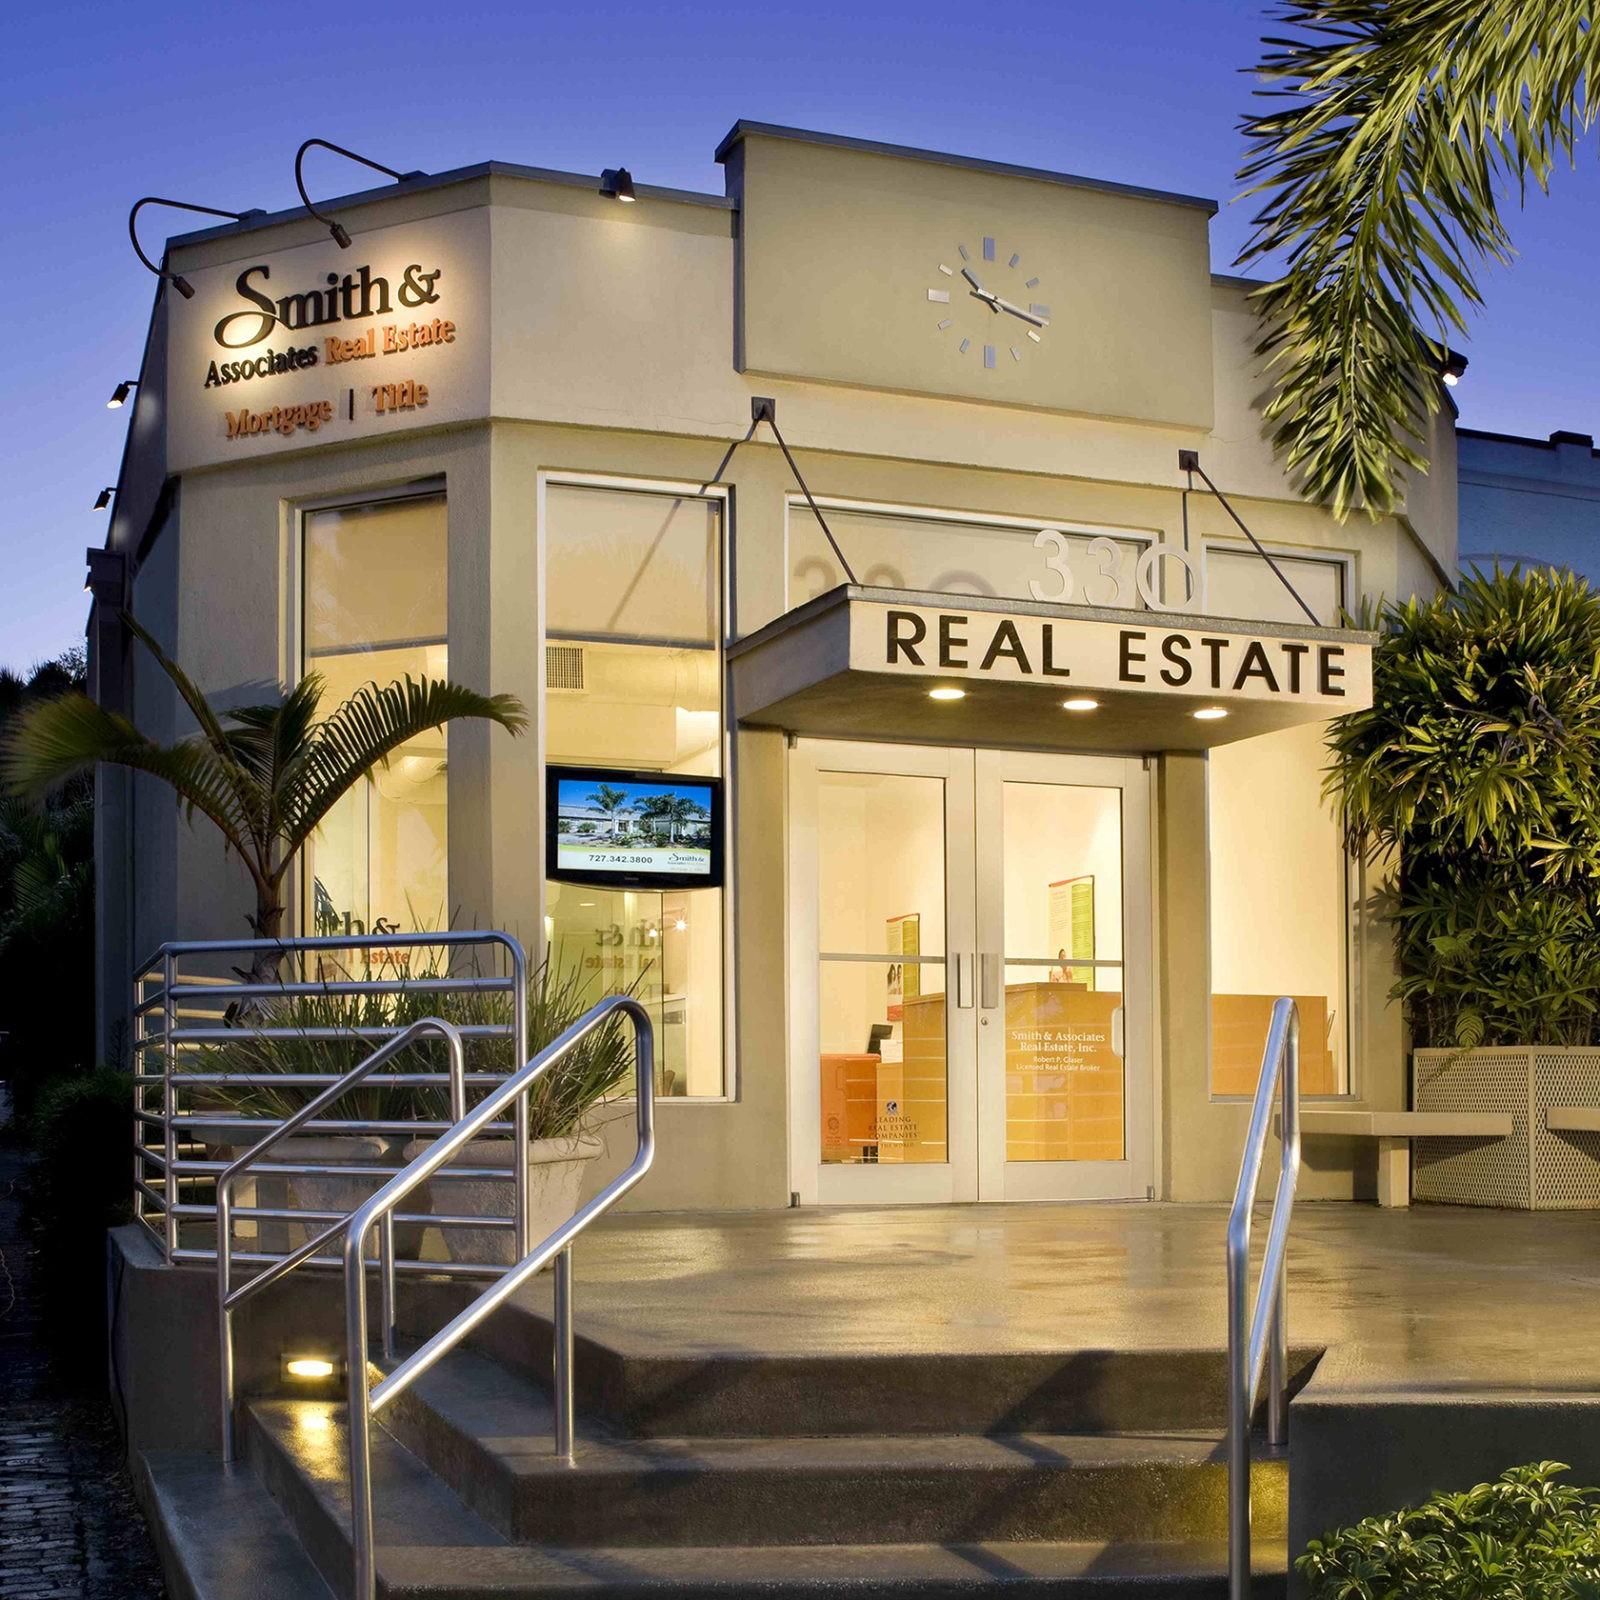 Snell Isle Apartments: Smith & Associates Real Estate